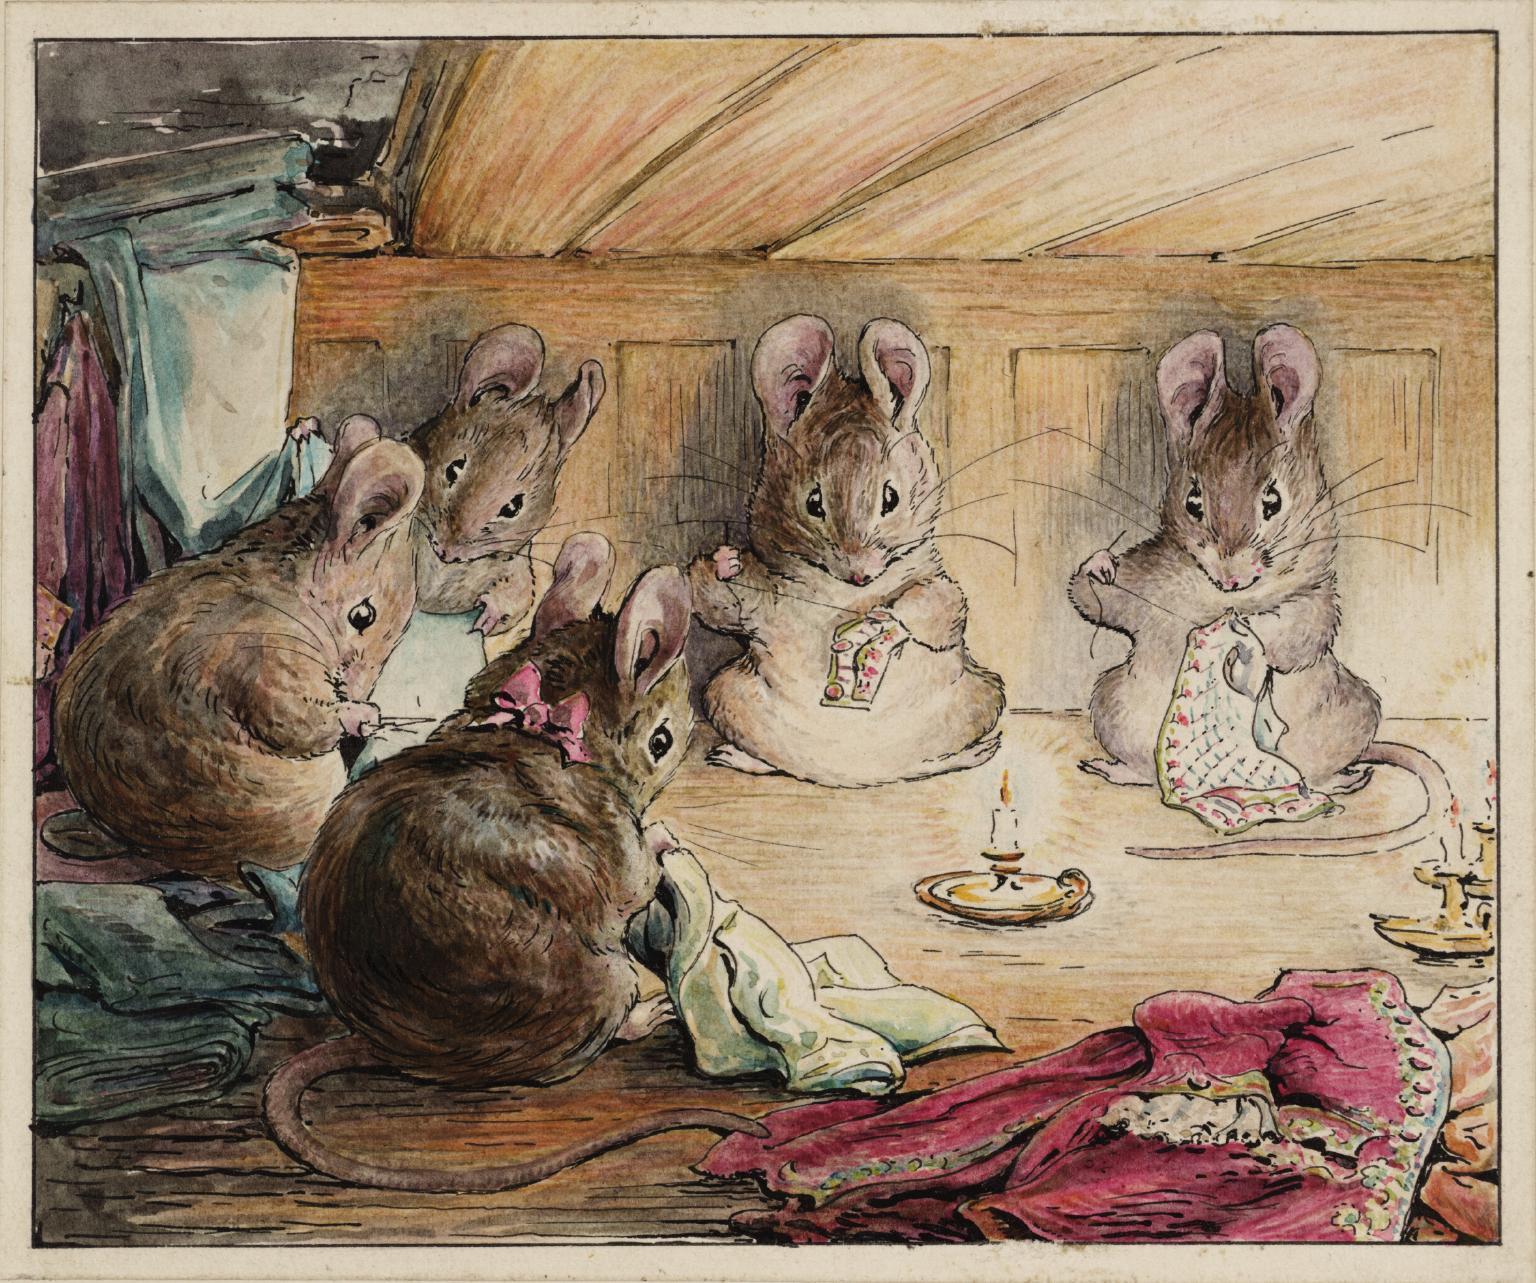 Art by Helen Beatrix Potter